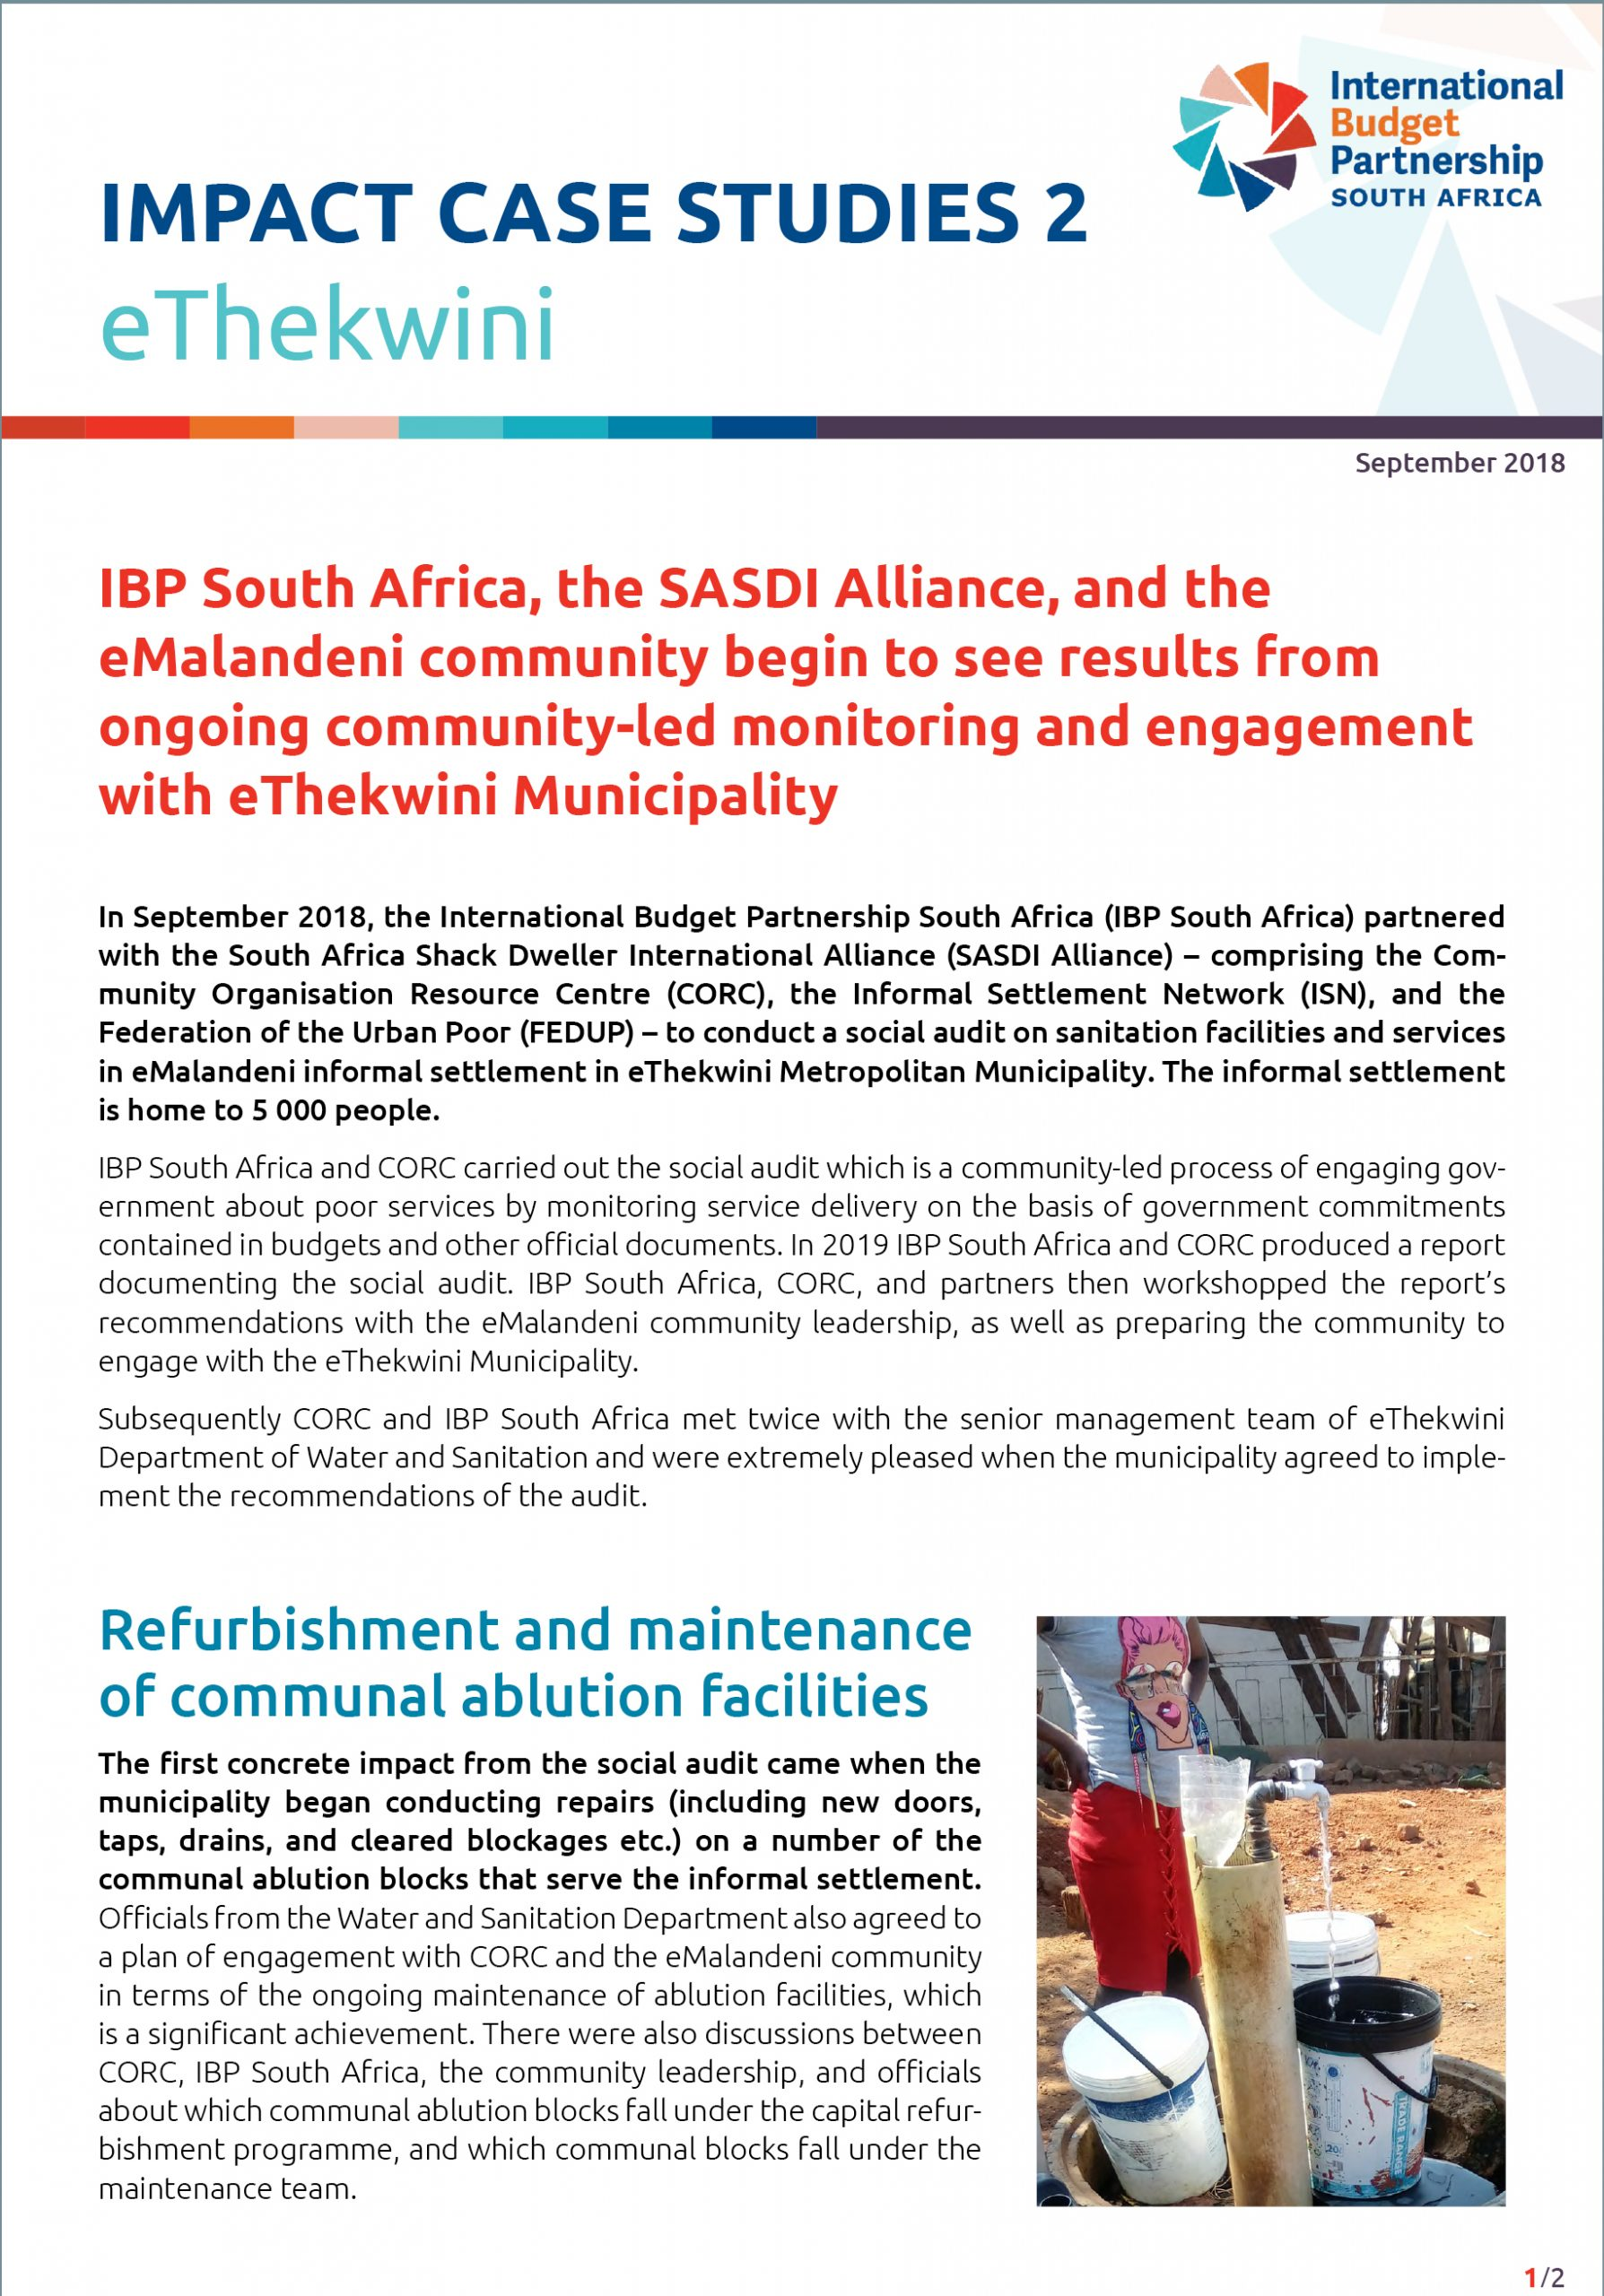 impact-case-studies-2-ethekwini-thumbnail-best